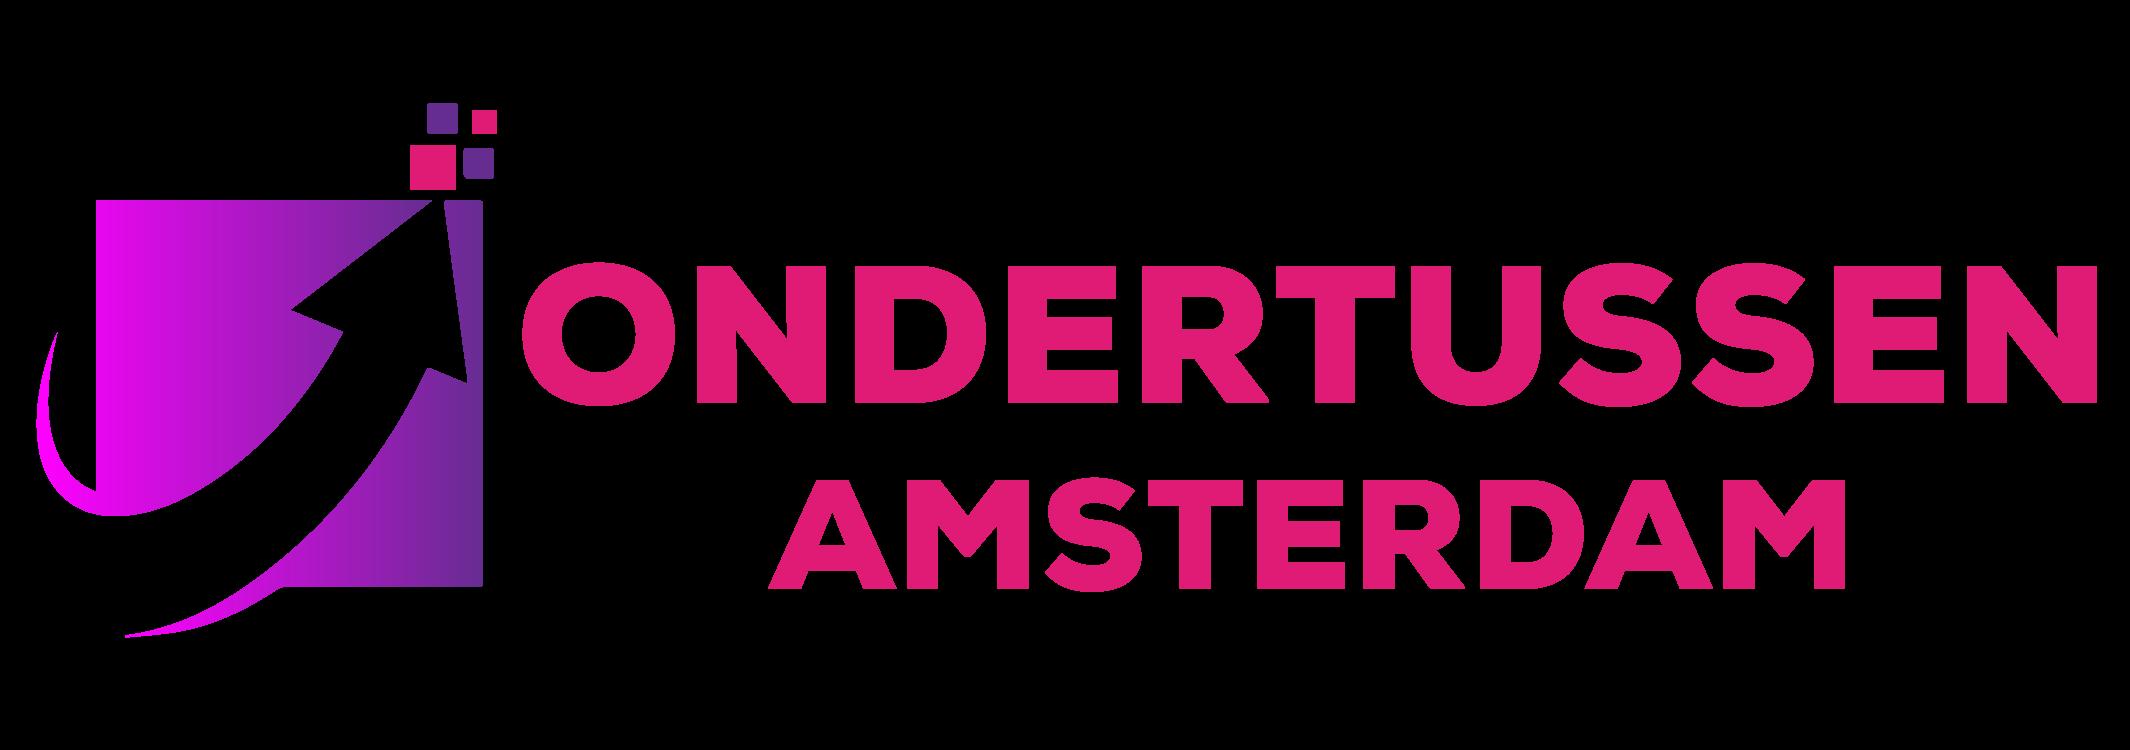 Ondertussen Amsterdam